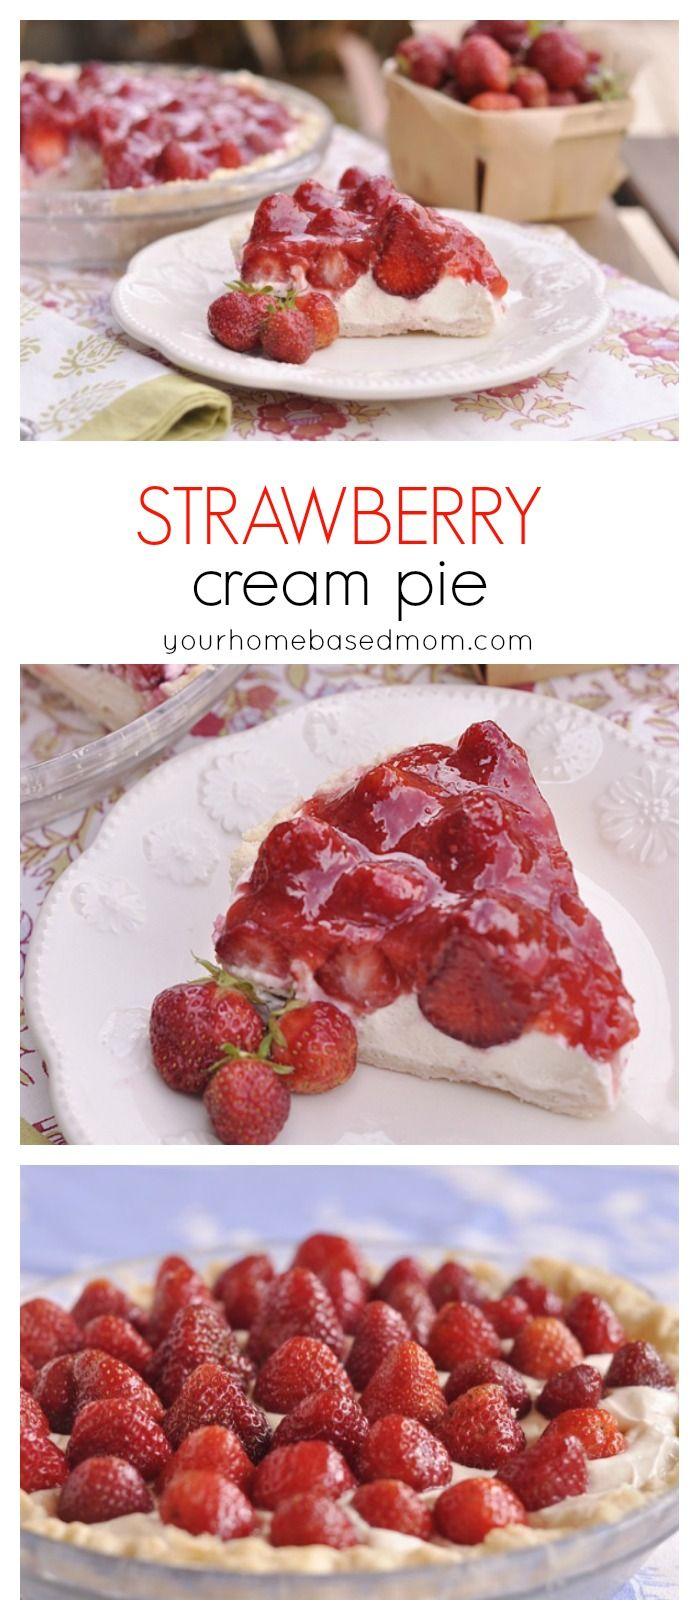 Strawberry cream pies, Tart recipes and Cream pies on Pinterest